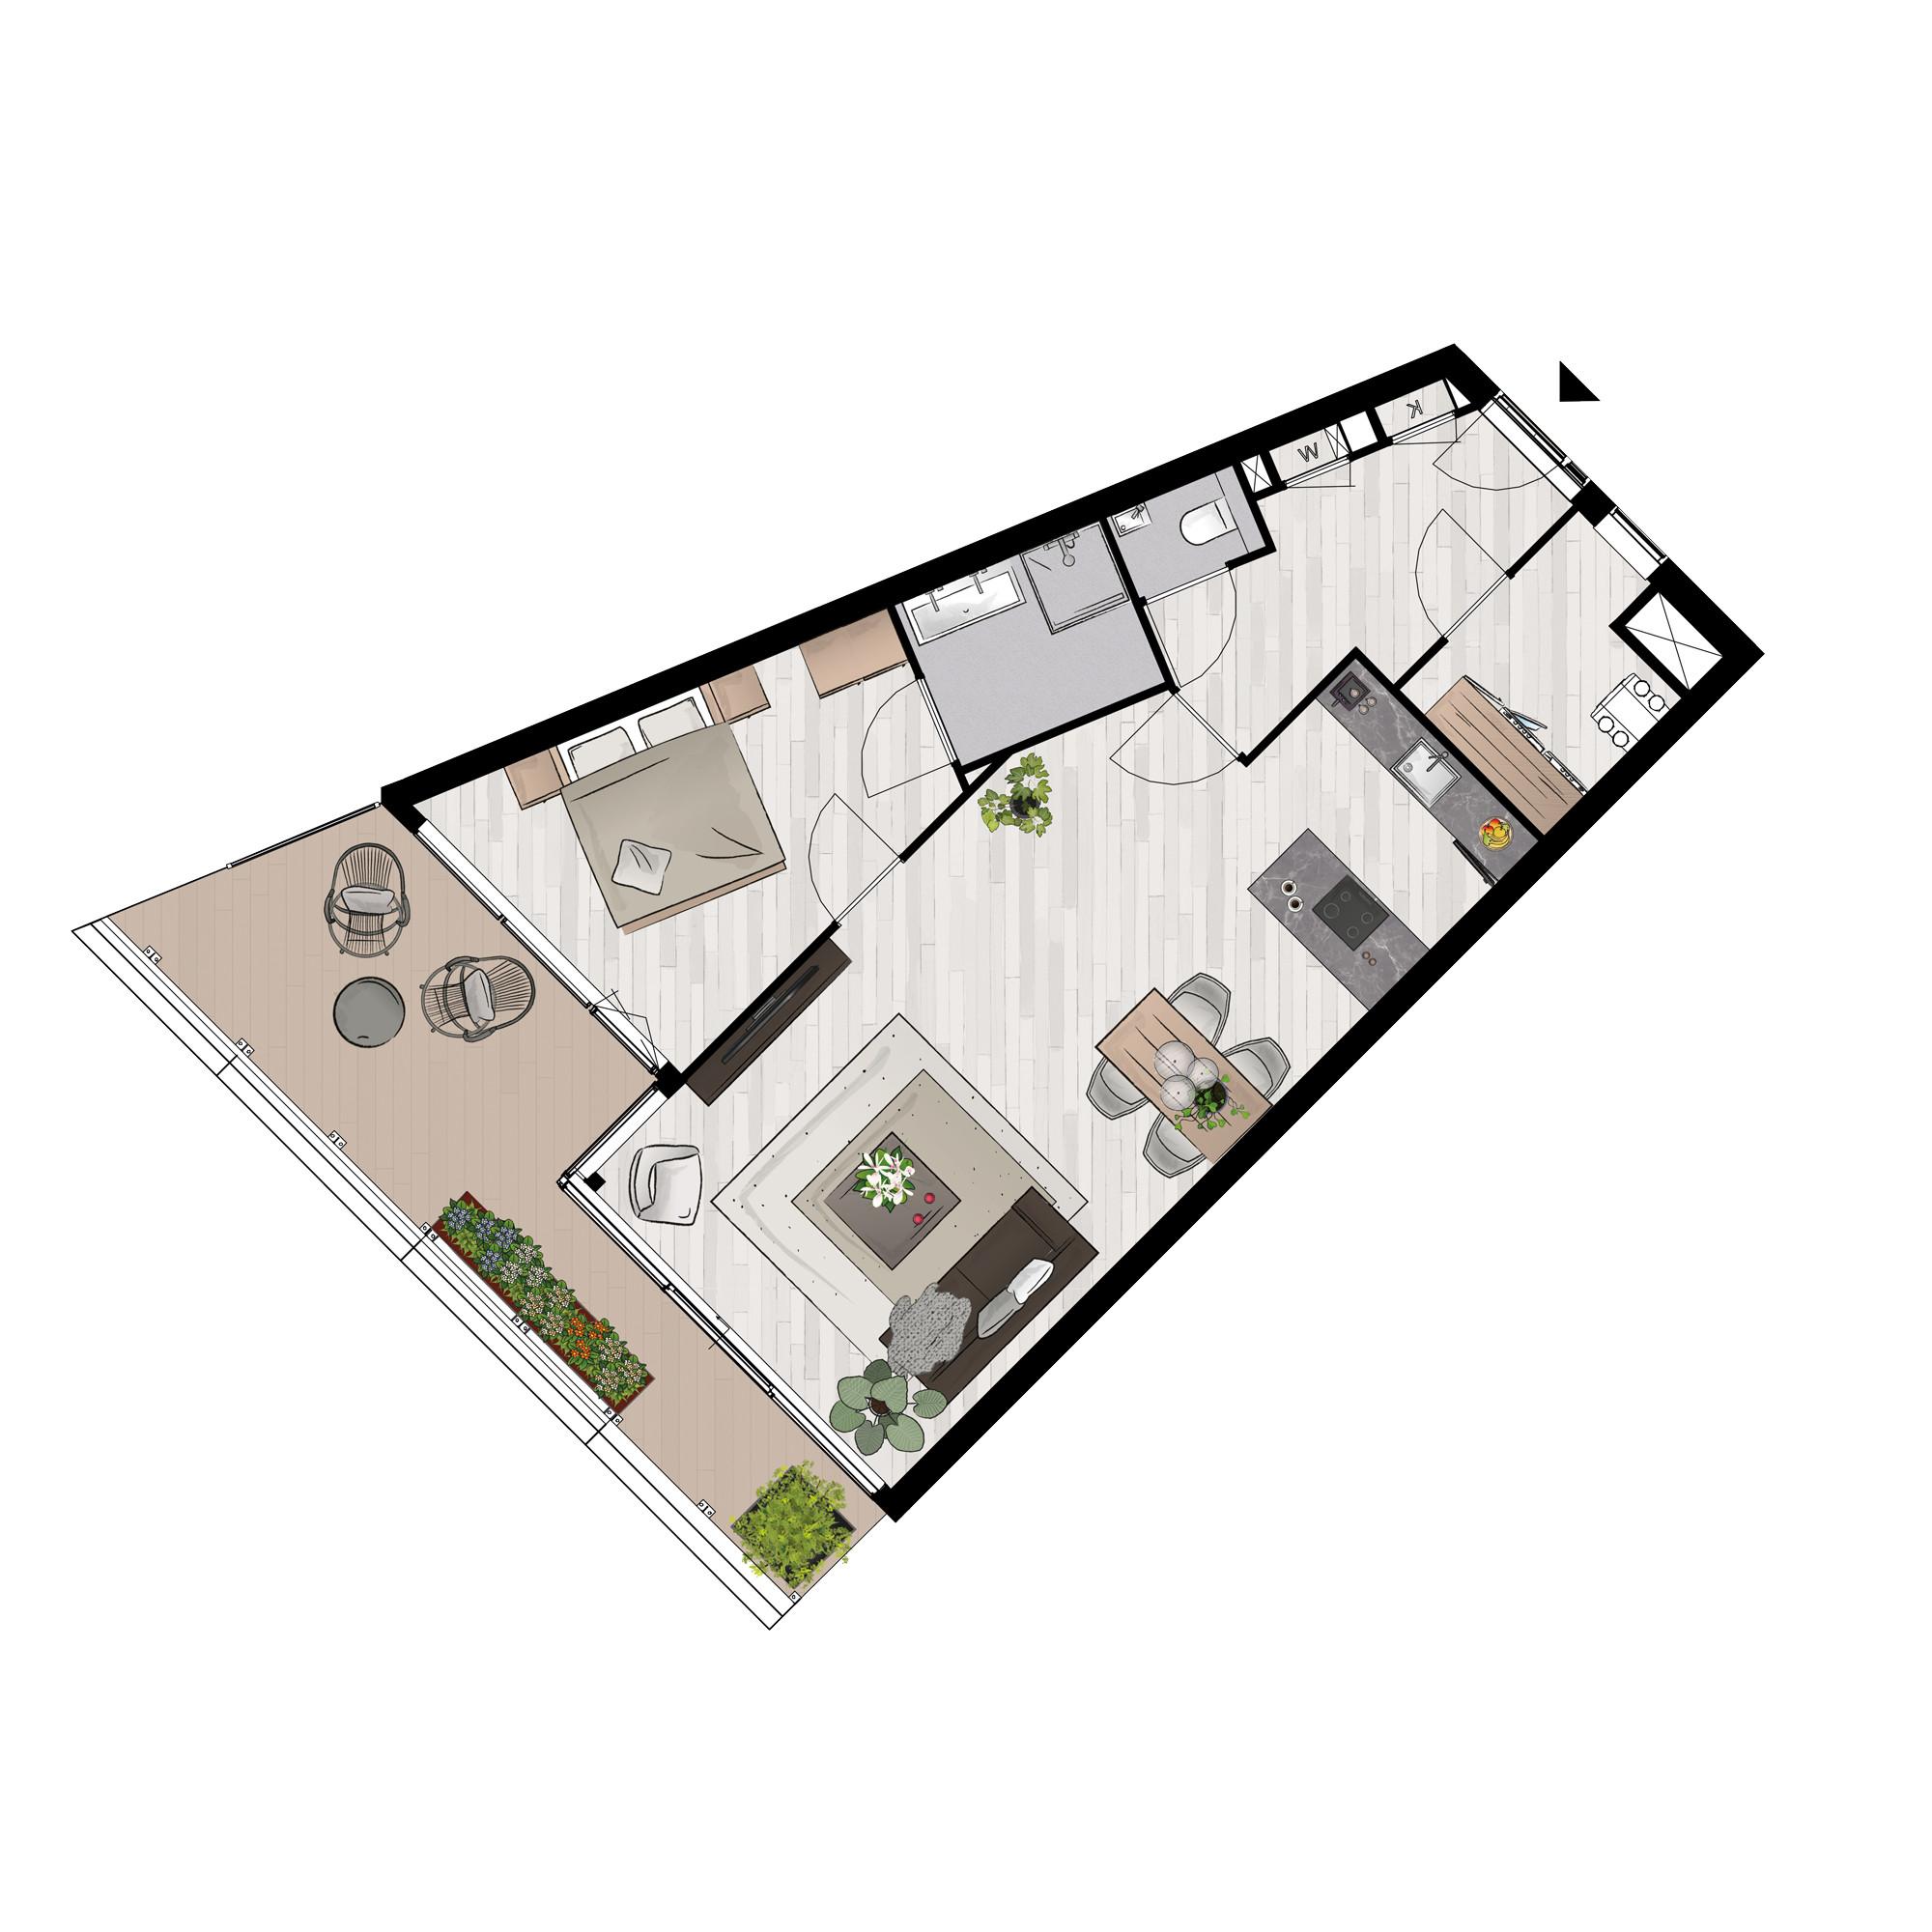 Specials vloer map